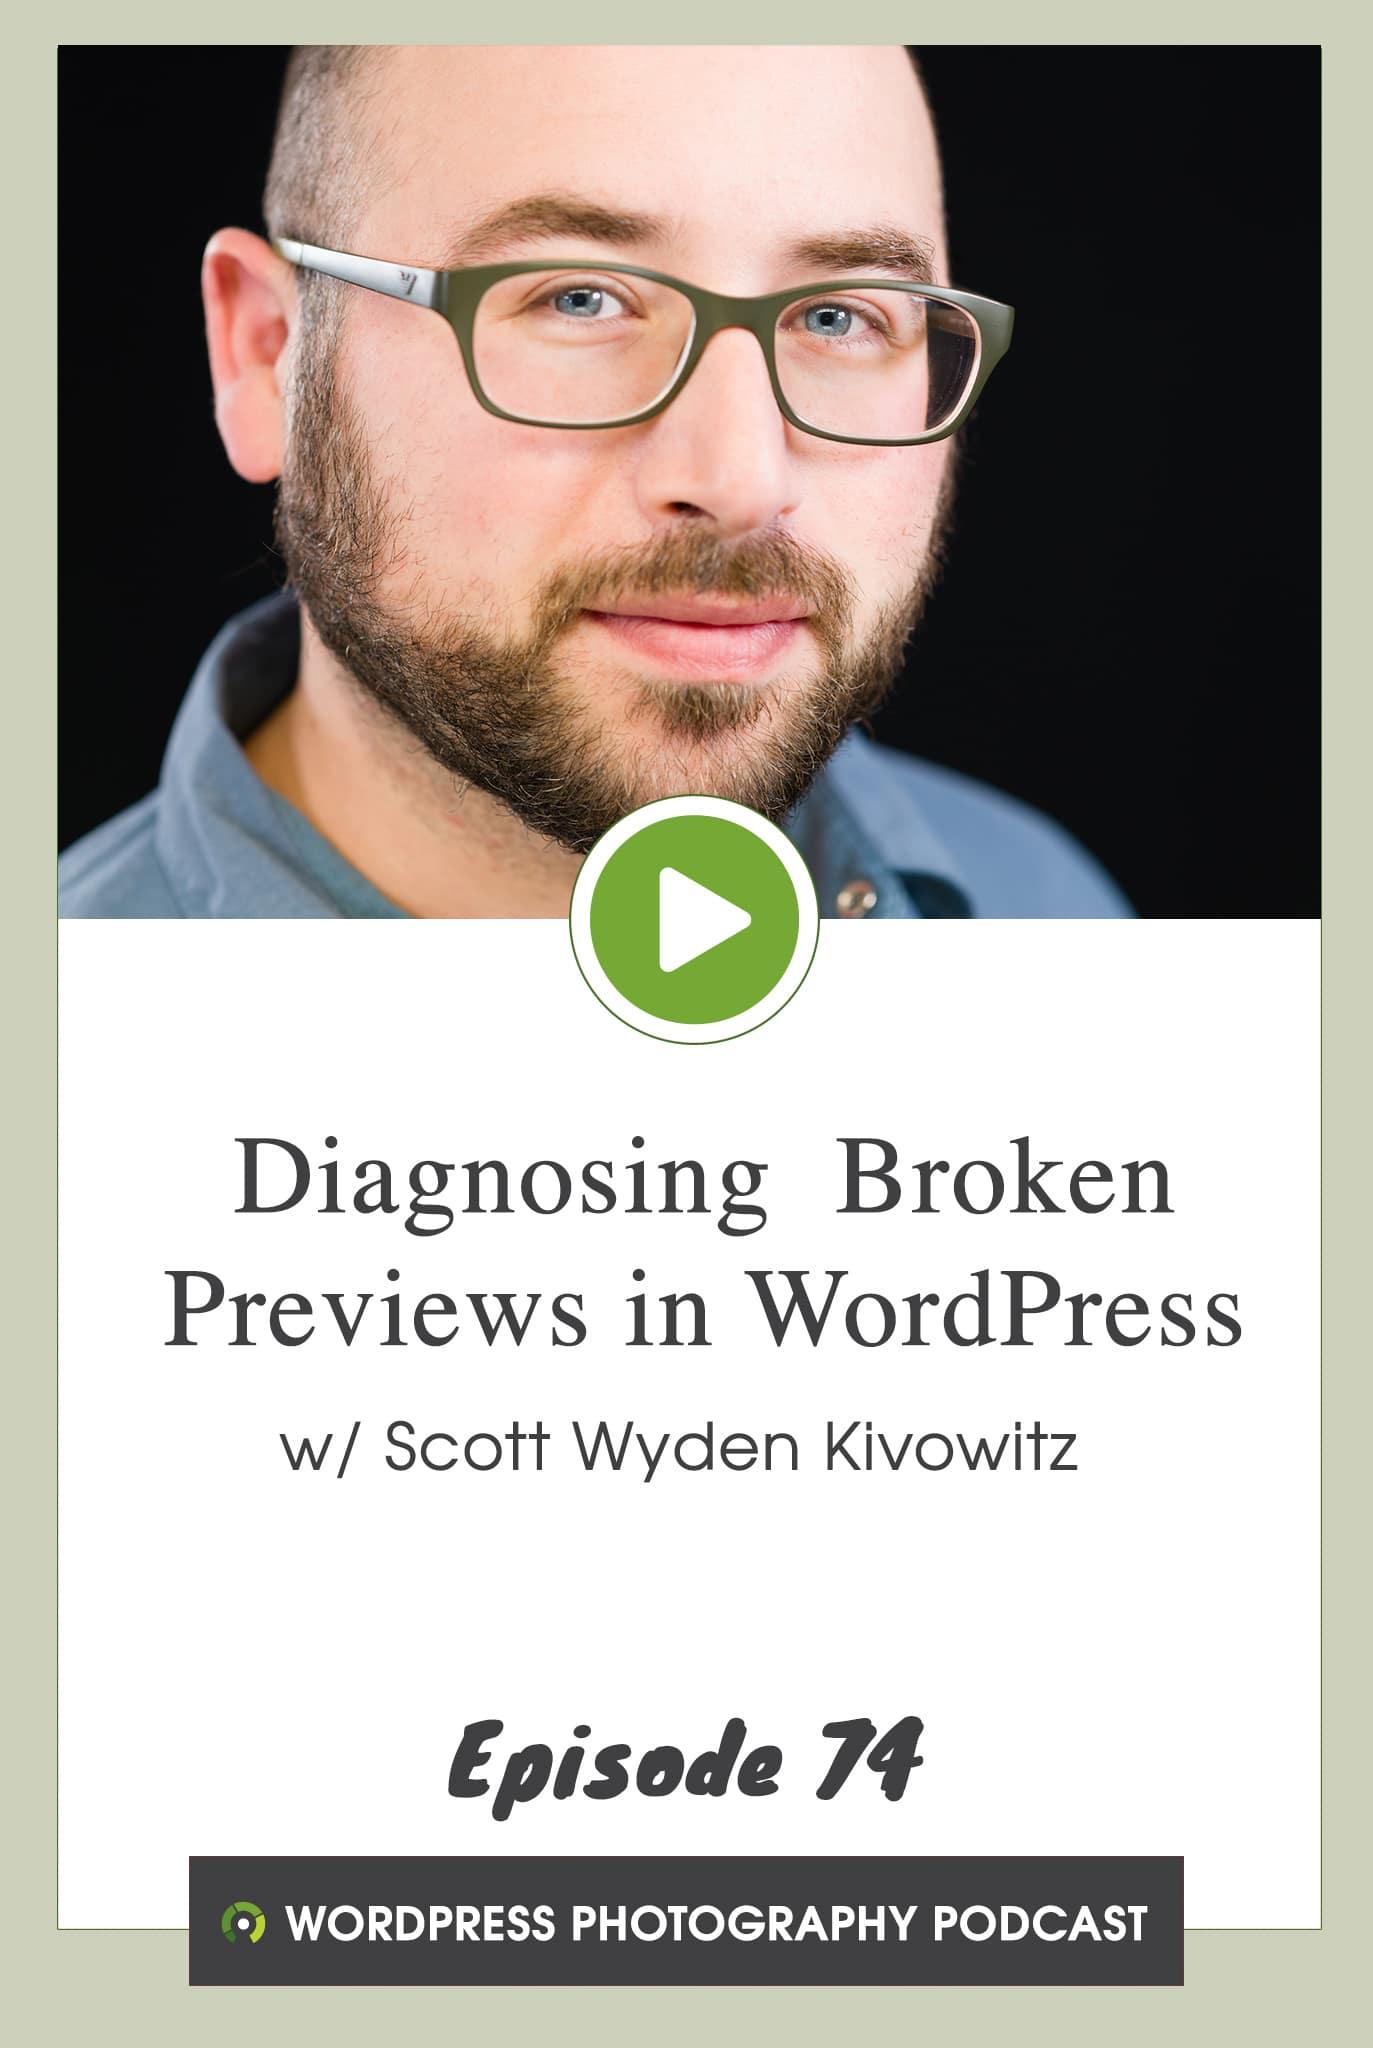 Episode 74 – Diagnosing  Broken Previews in WordPress